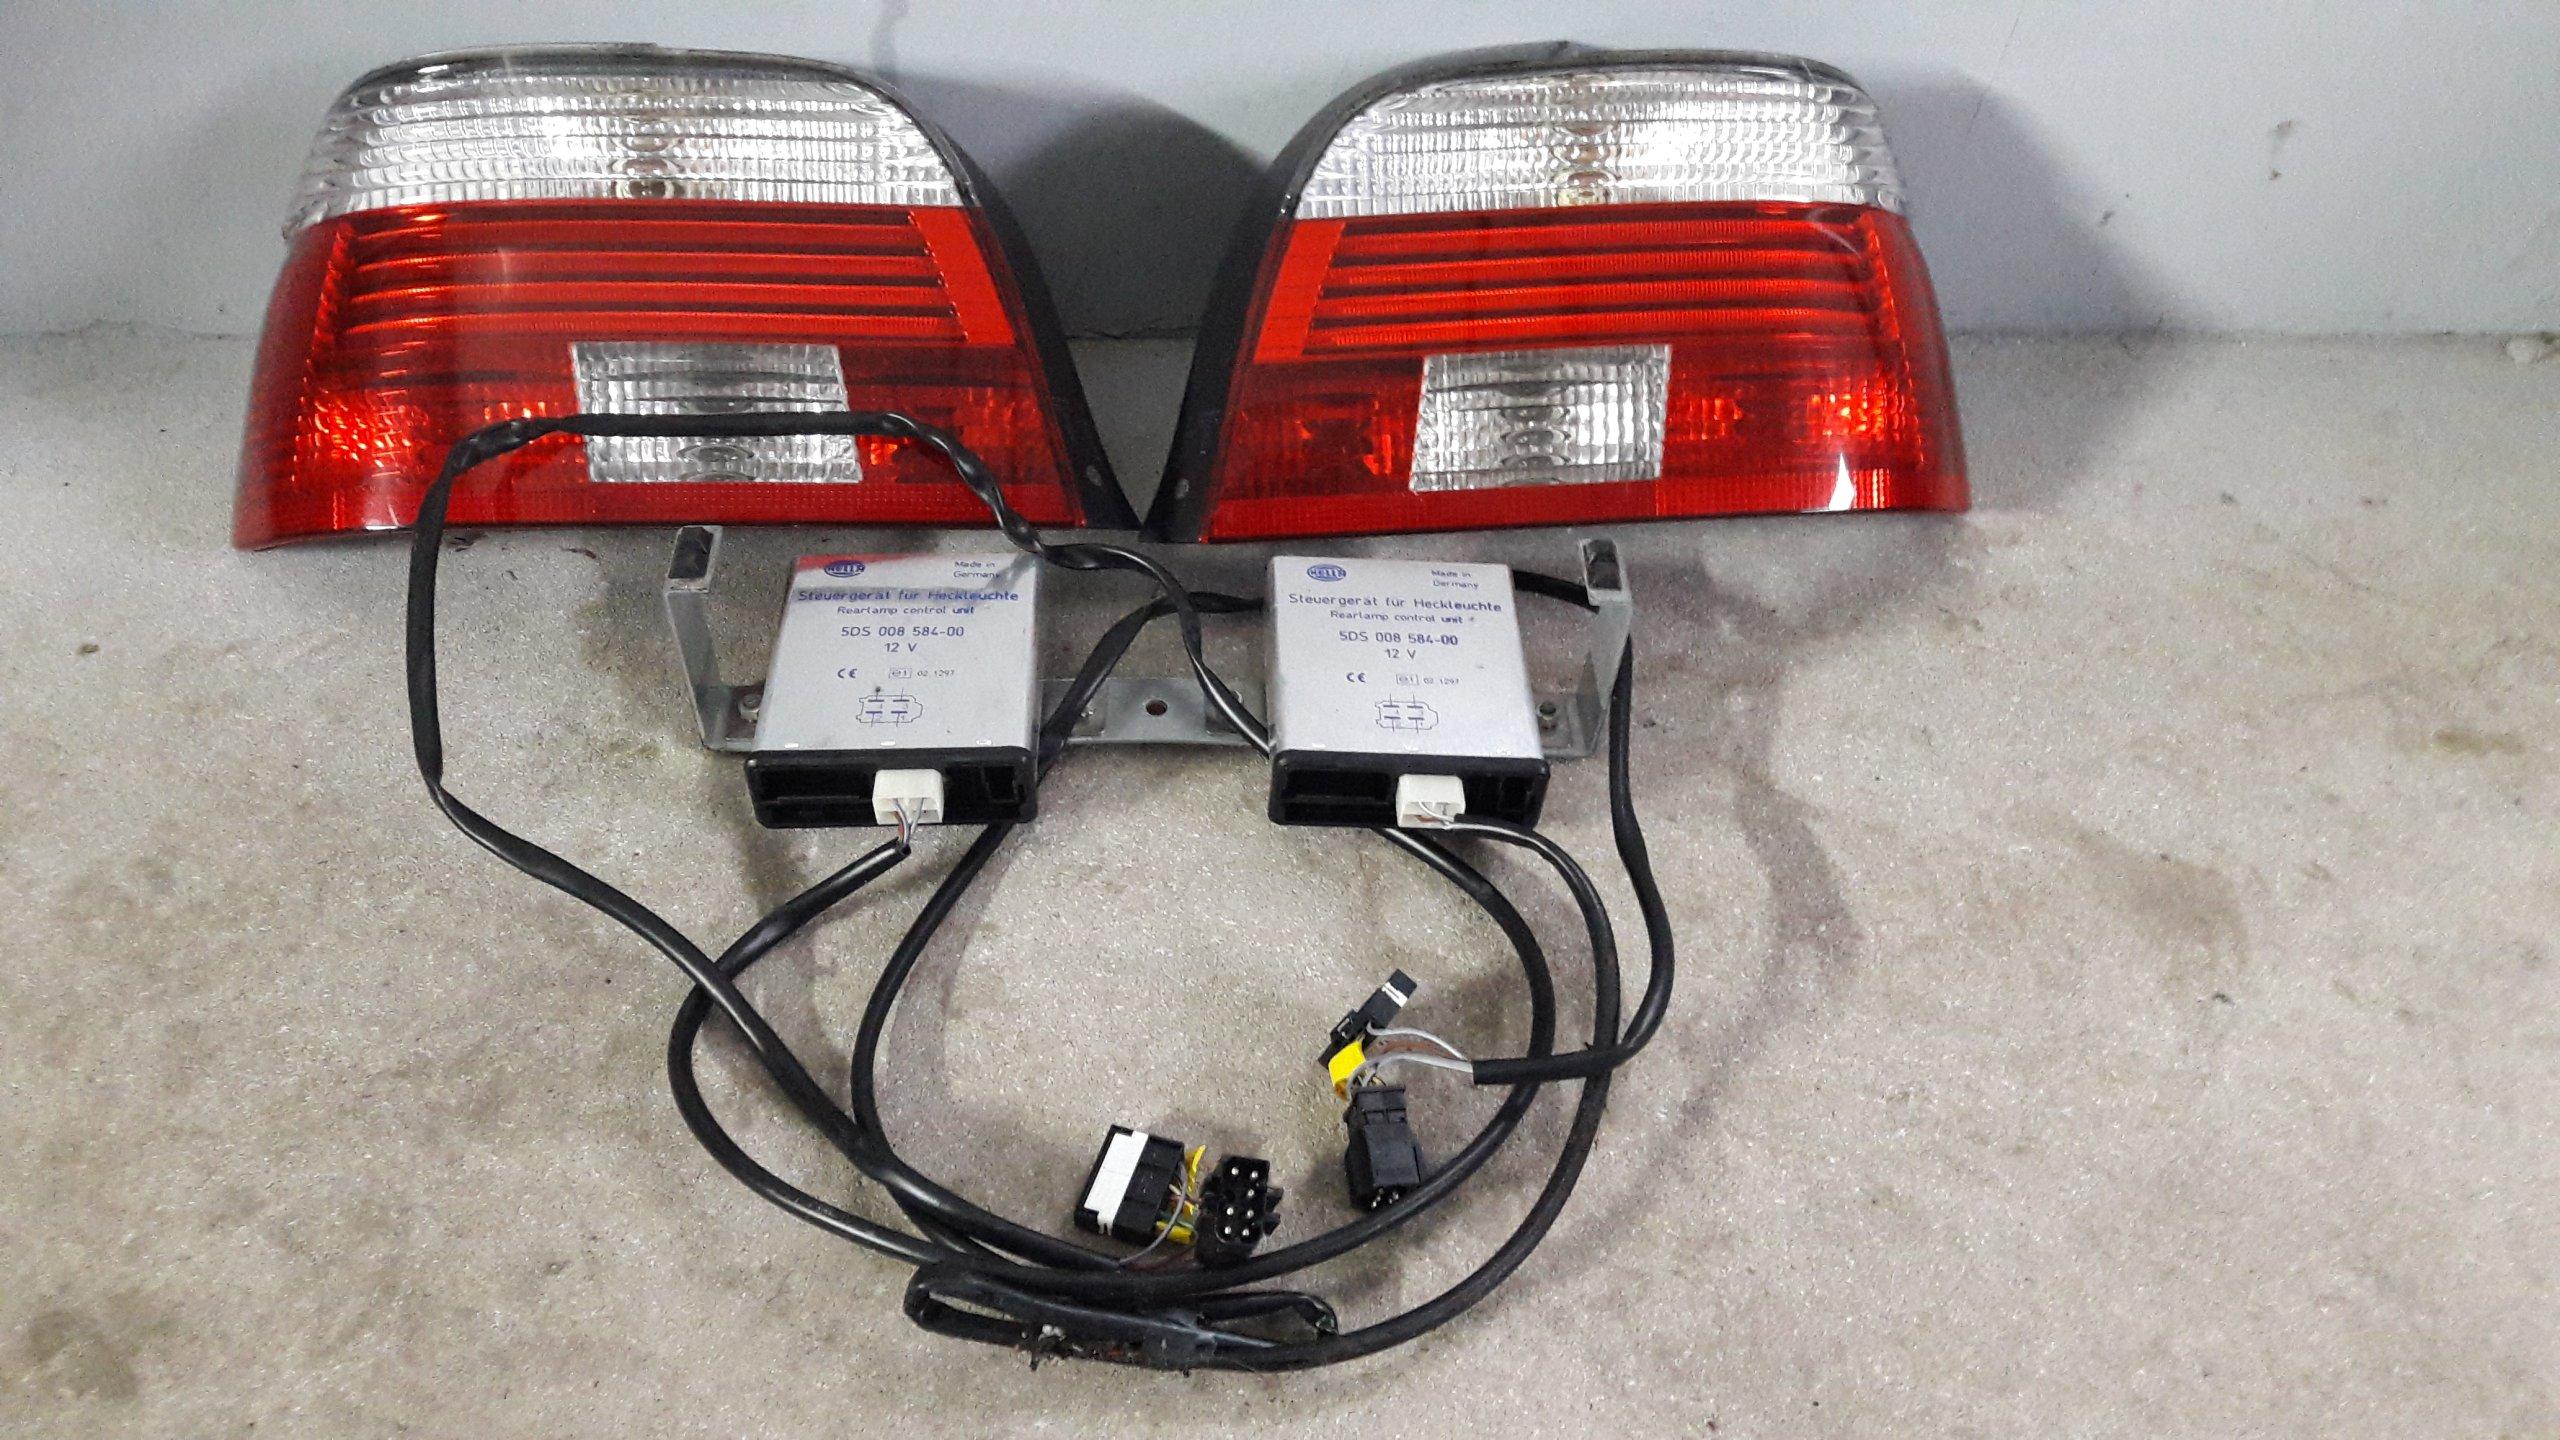 Lampa Lampy Tylna Do Bmw E39 Sedan Lift Led Moduł